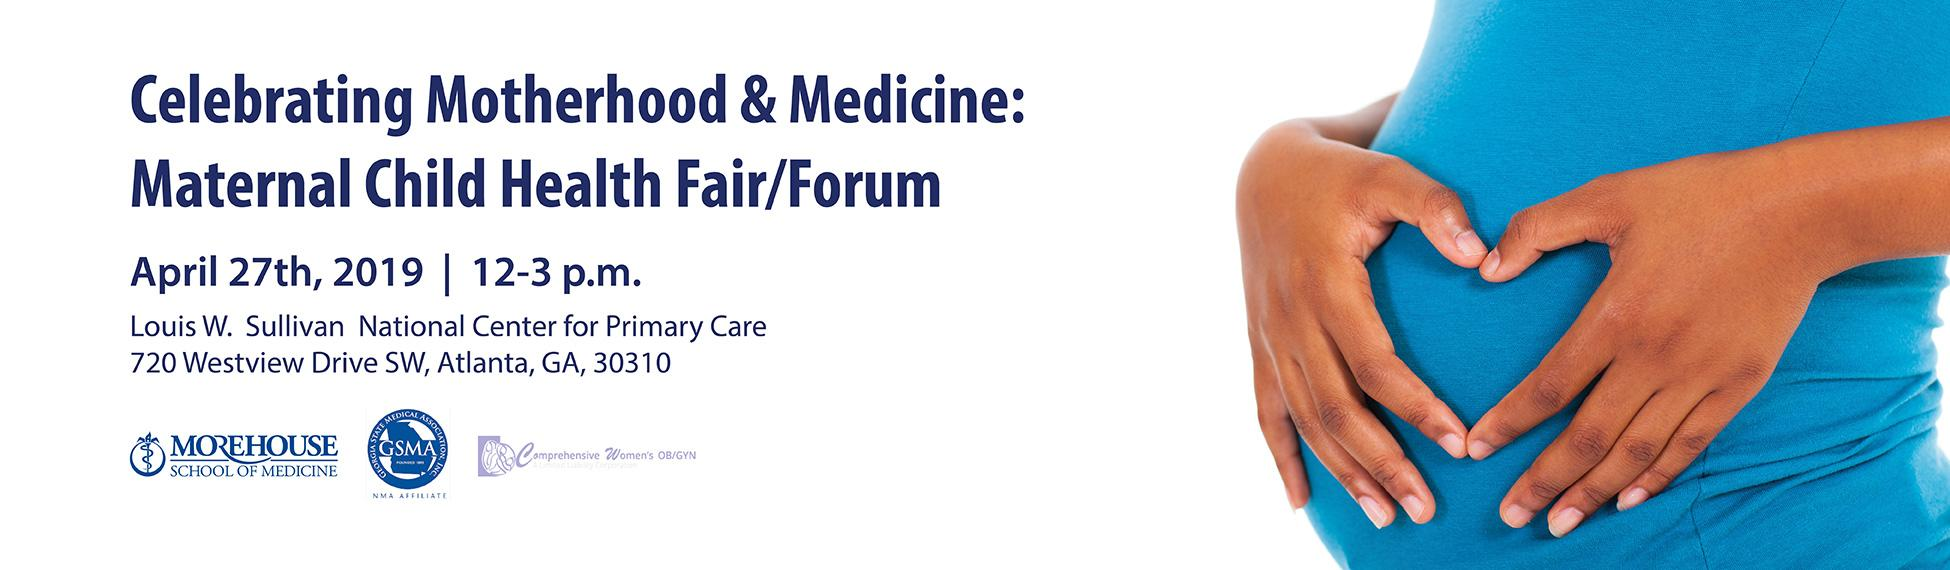 Celebrating Motherhood & Medicine: Maternal Child Health Fair/Forum